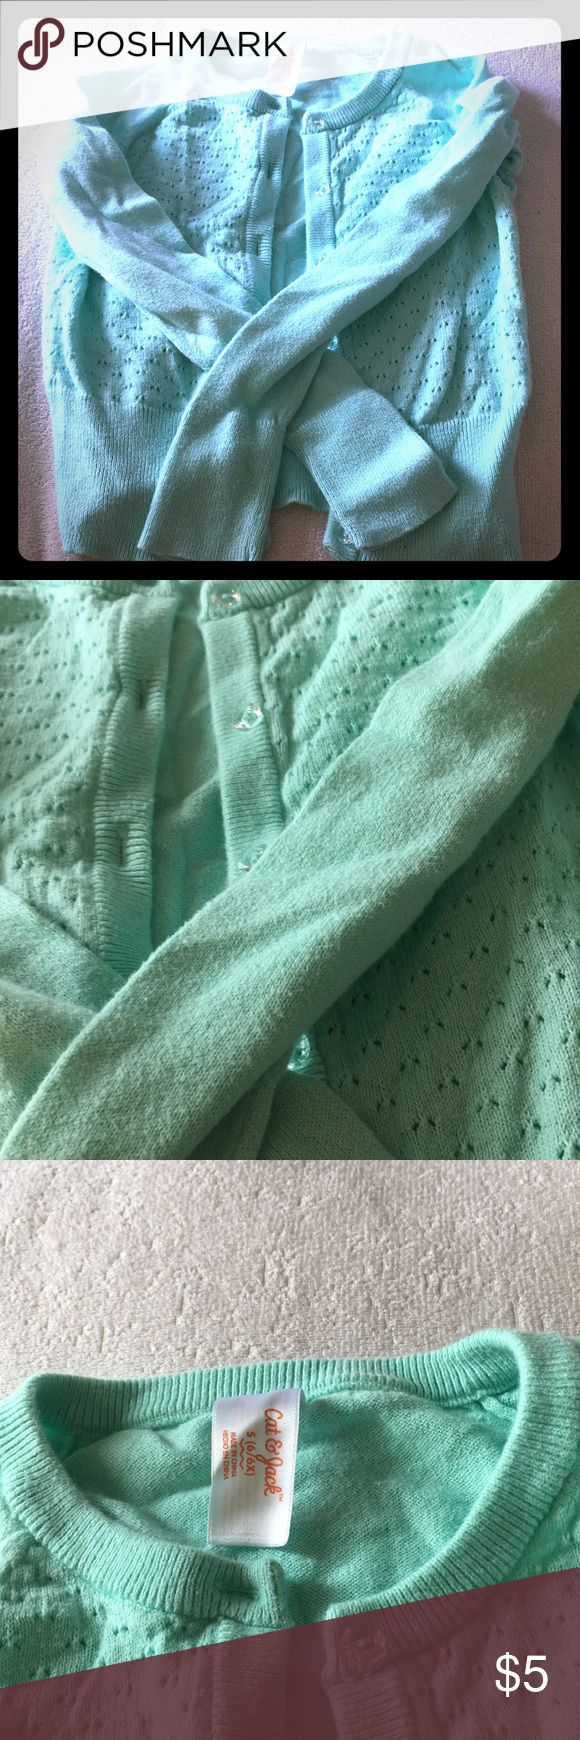 Girls teal cardigan size 6/6x Girls teal cardigan GUC worn once , teal size 6/6x Cat & Jack Shirts & Tops